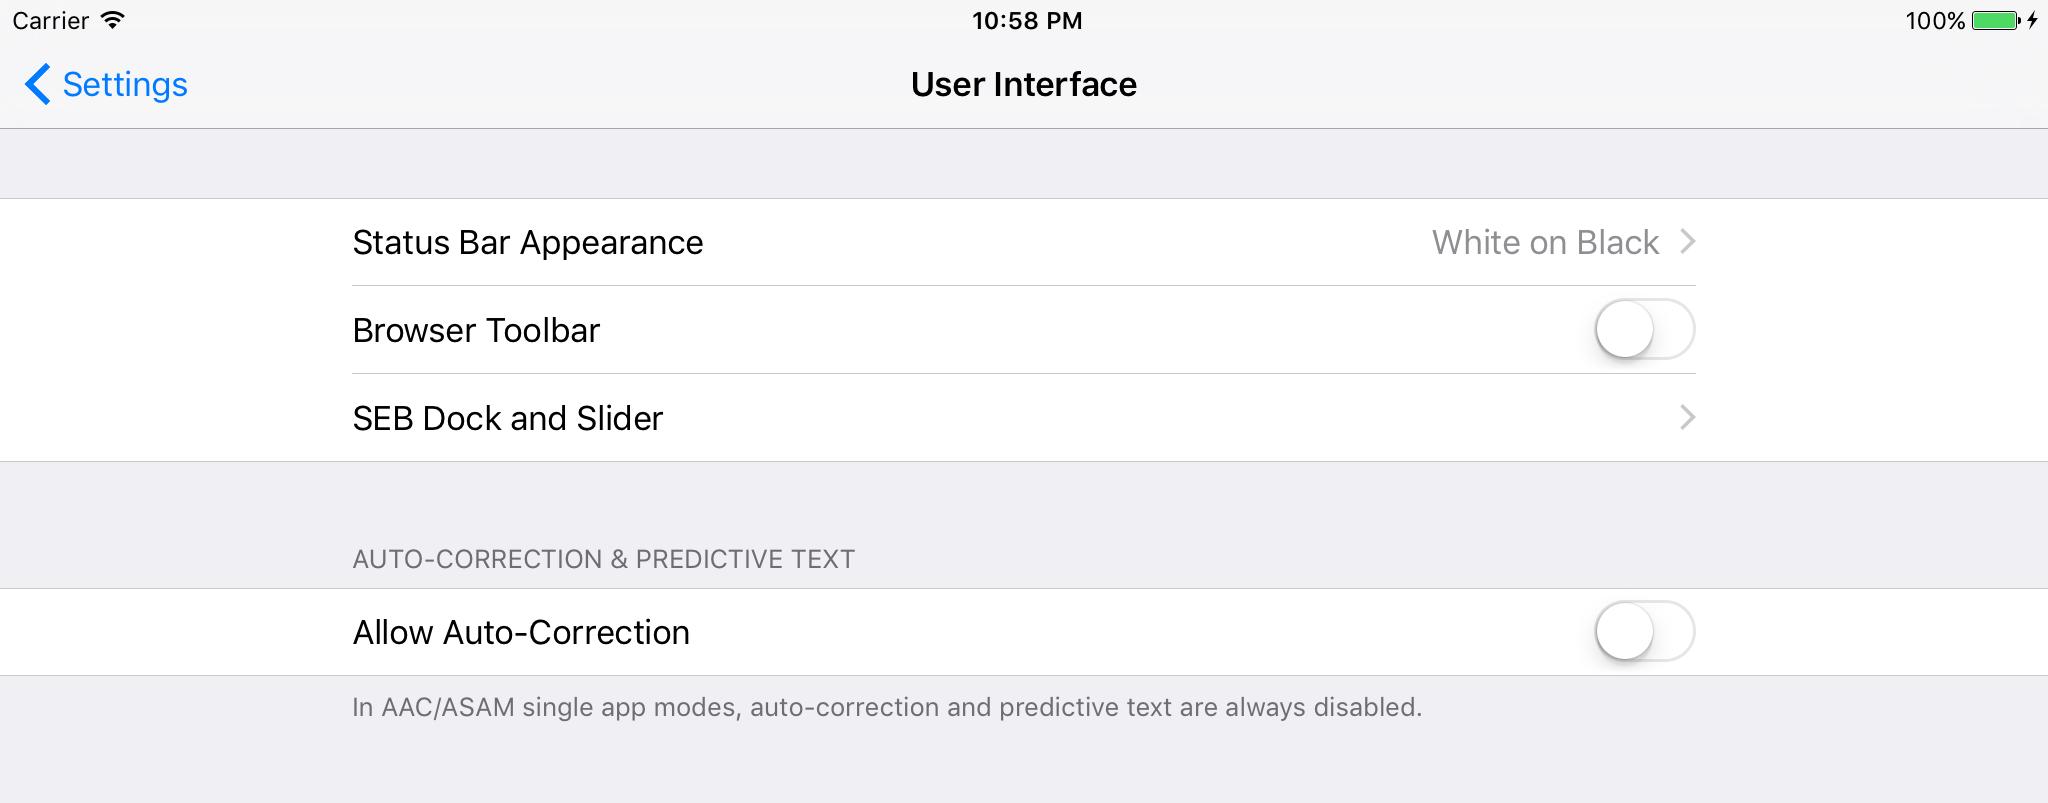 Safe Exam Browser - iOS User Manual